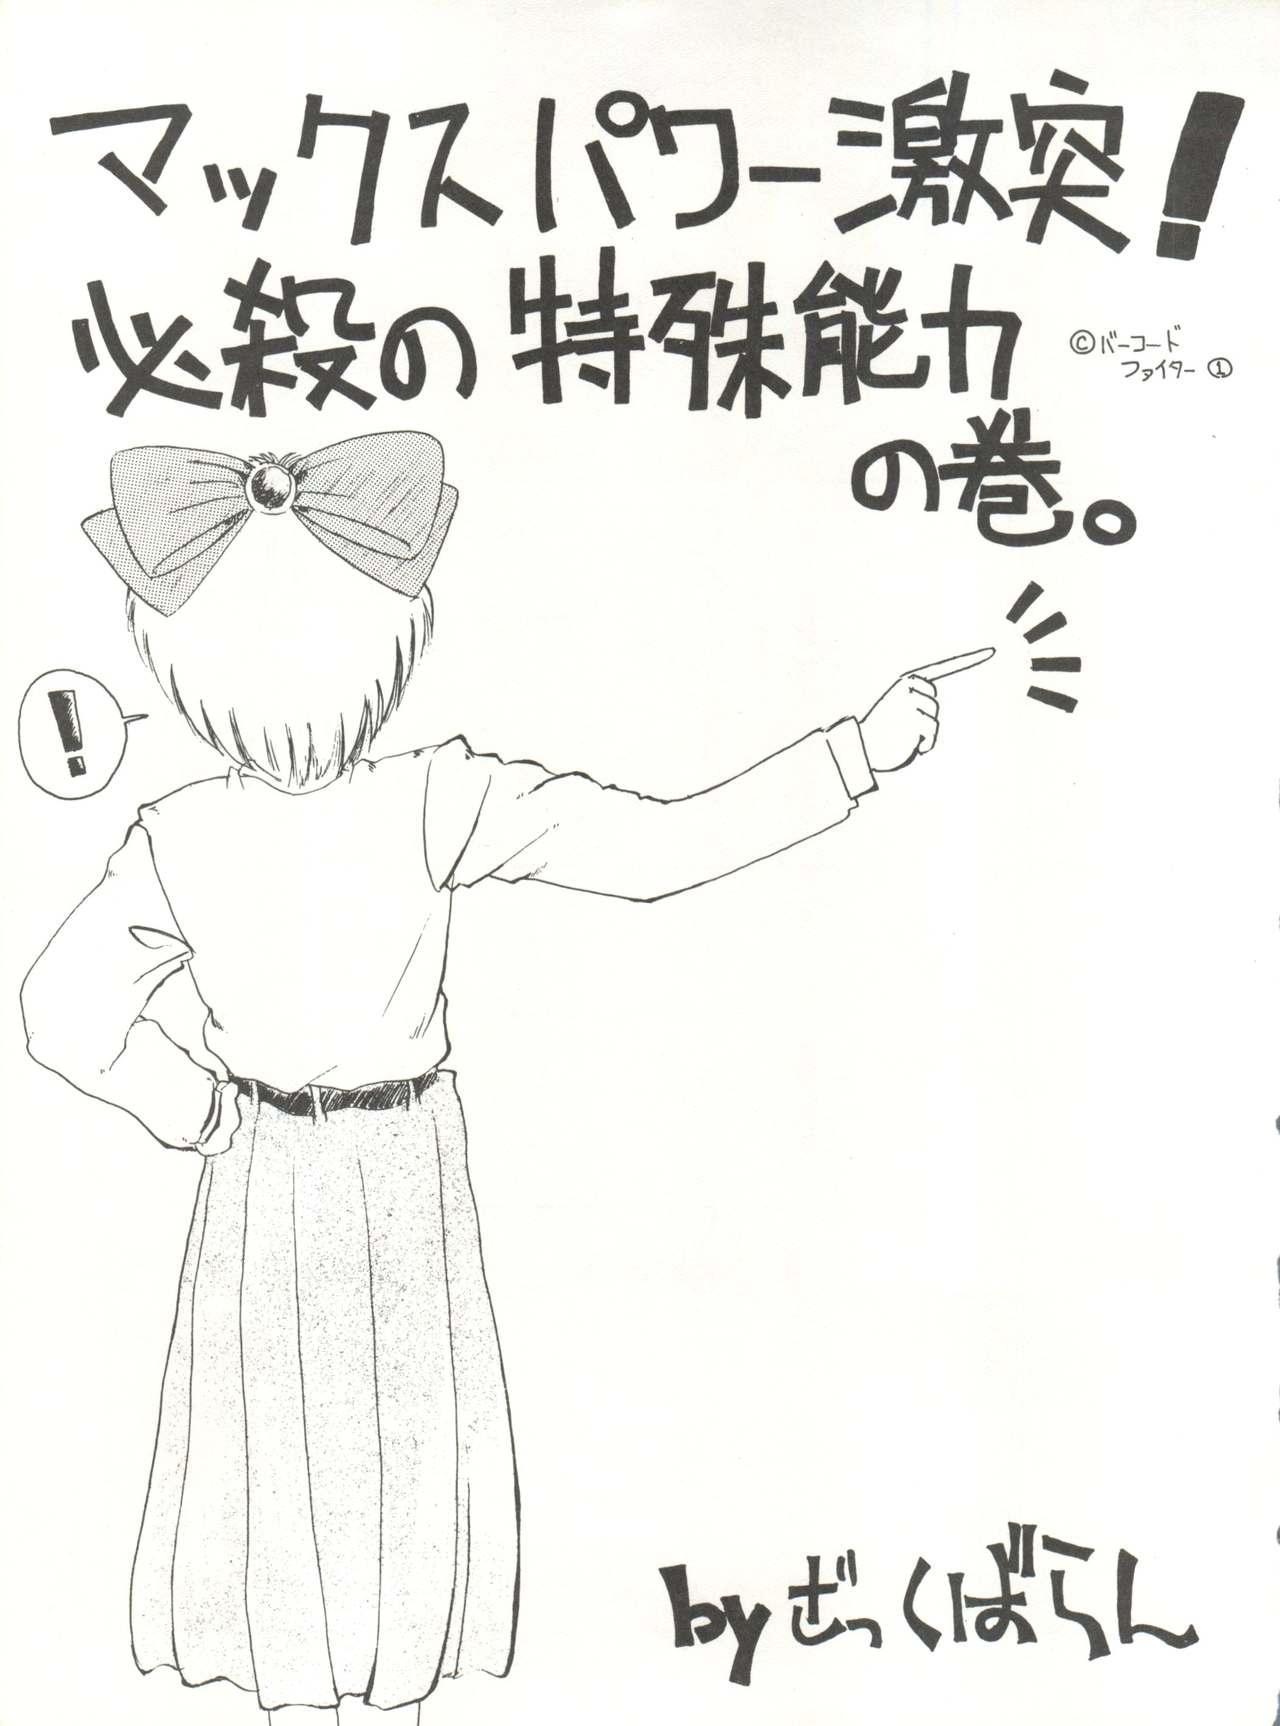 [Global One (MARO)] Sadistic 5 (Cutey Honey, Devilman, Sailor Moon), [Global One (MARO)] Sadistic (Dirty Pair, Fushigi no Umi no Nadia, Sailor Moon), [Studio Ikkatsumajin] .ribbon (Hime-chan's Ribbon) 128